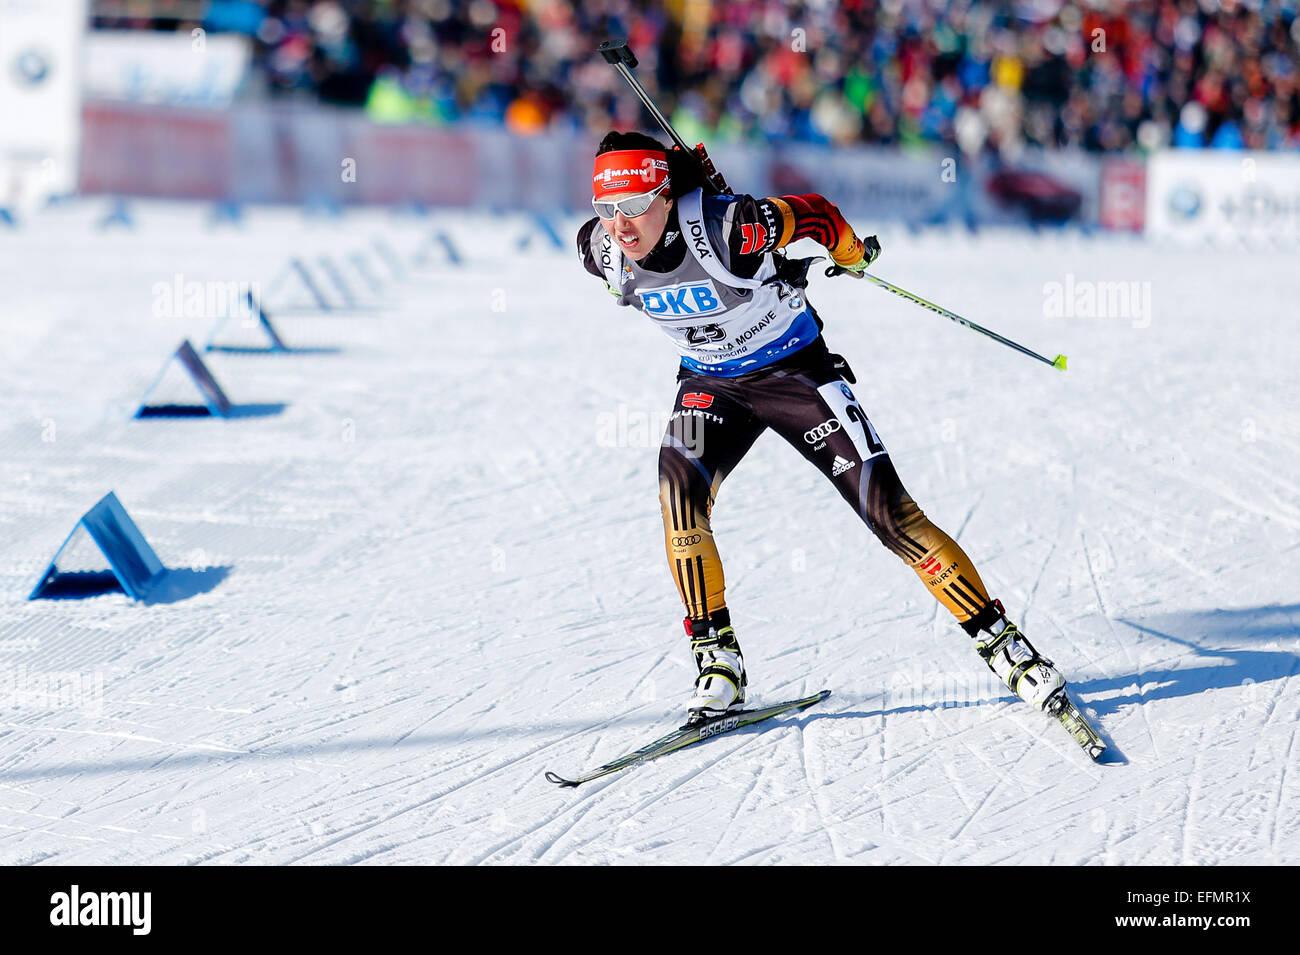 Nove Mesto Na Morave, Tschechische Republik. 7. Februar 2015. Laura Dahlmeier konkurriert bei der Biathlon-Weltcup Stockbild